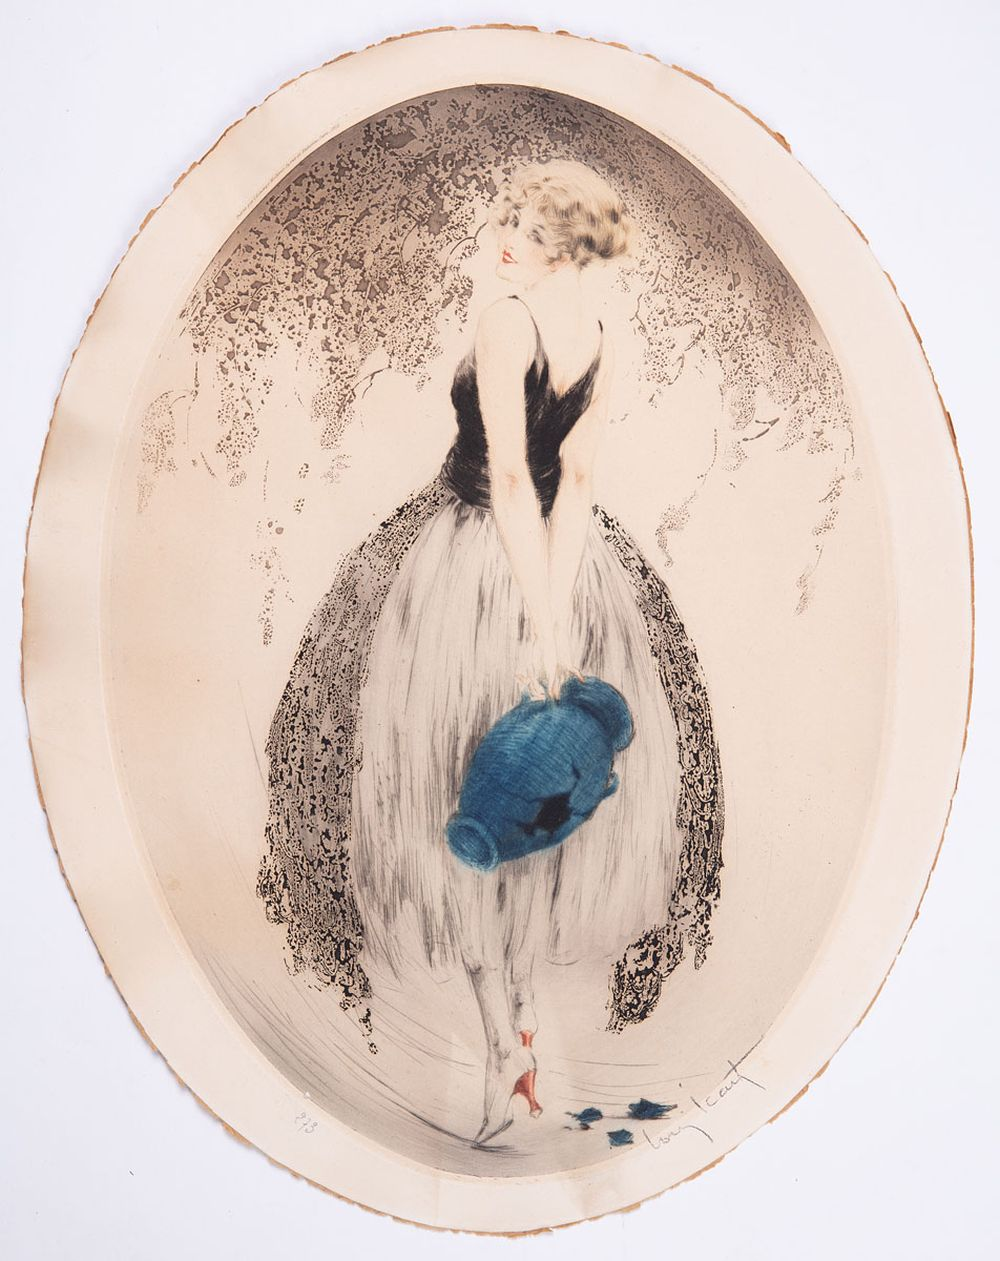 Louis ICART (Toulouse, 1888 - Paris, 1950). - Jeune fil